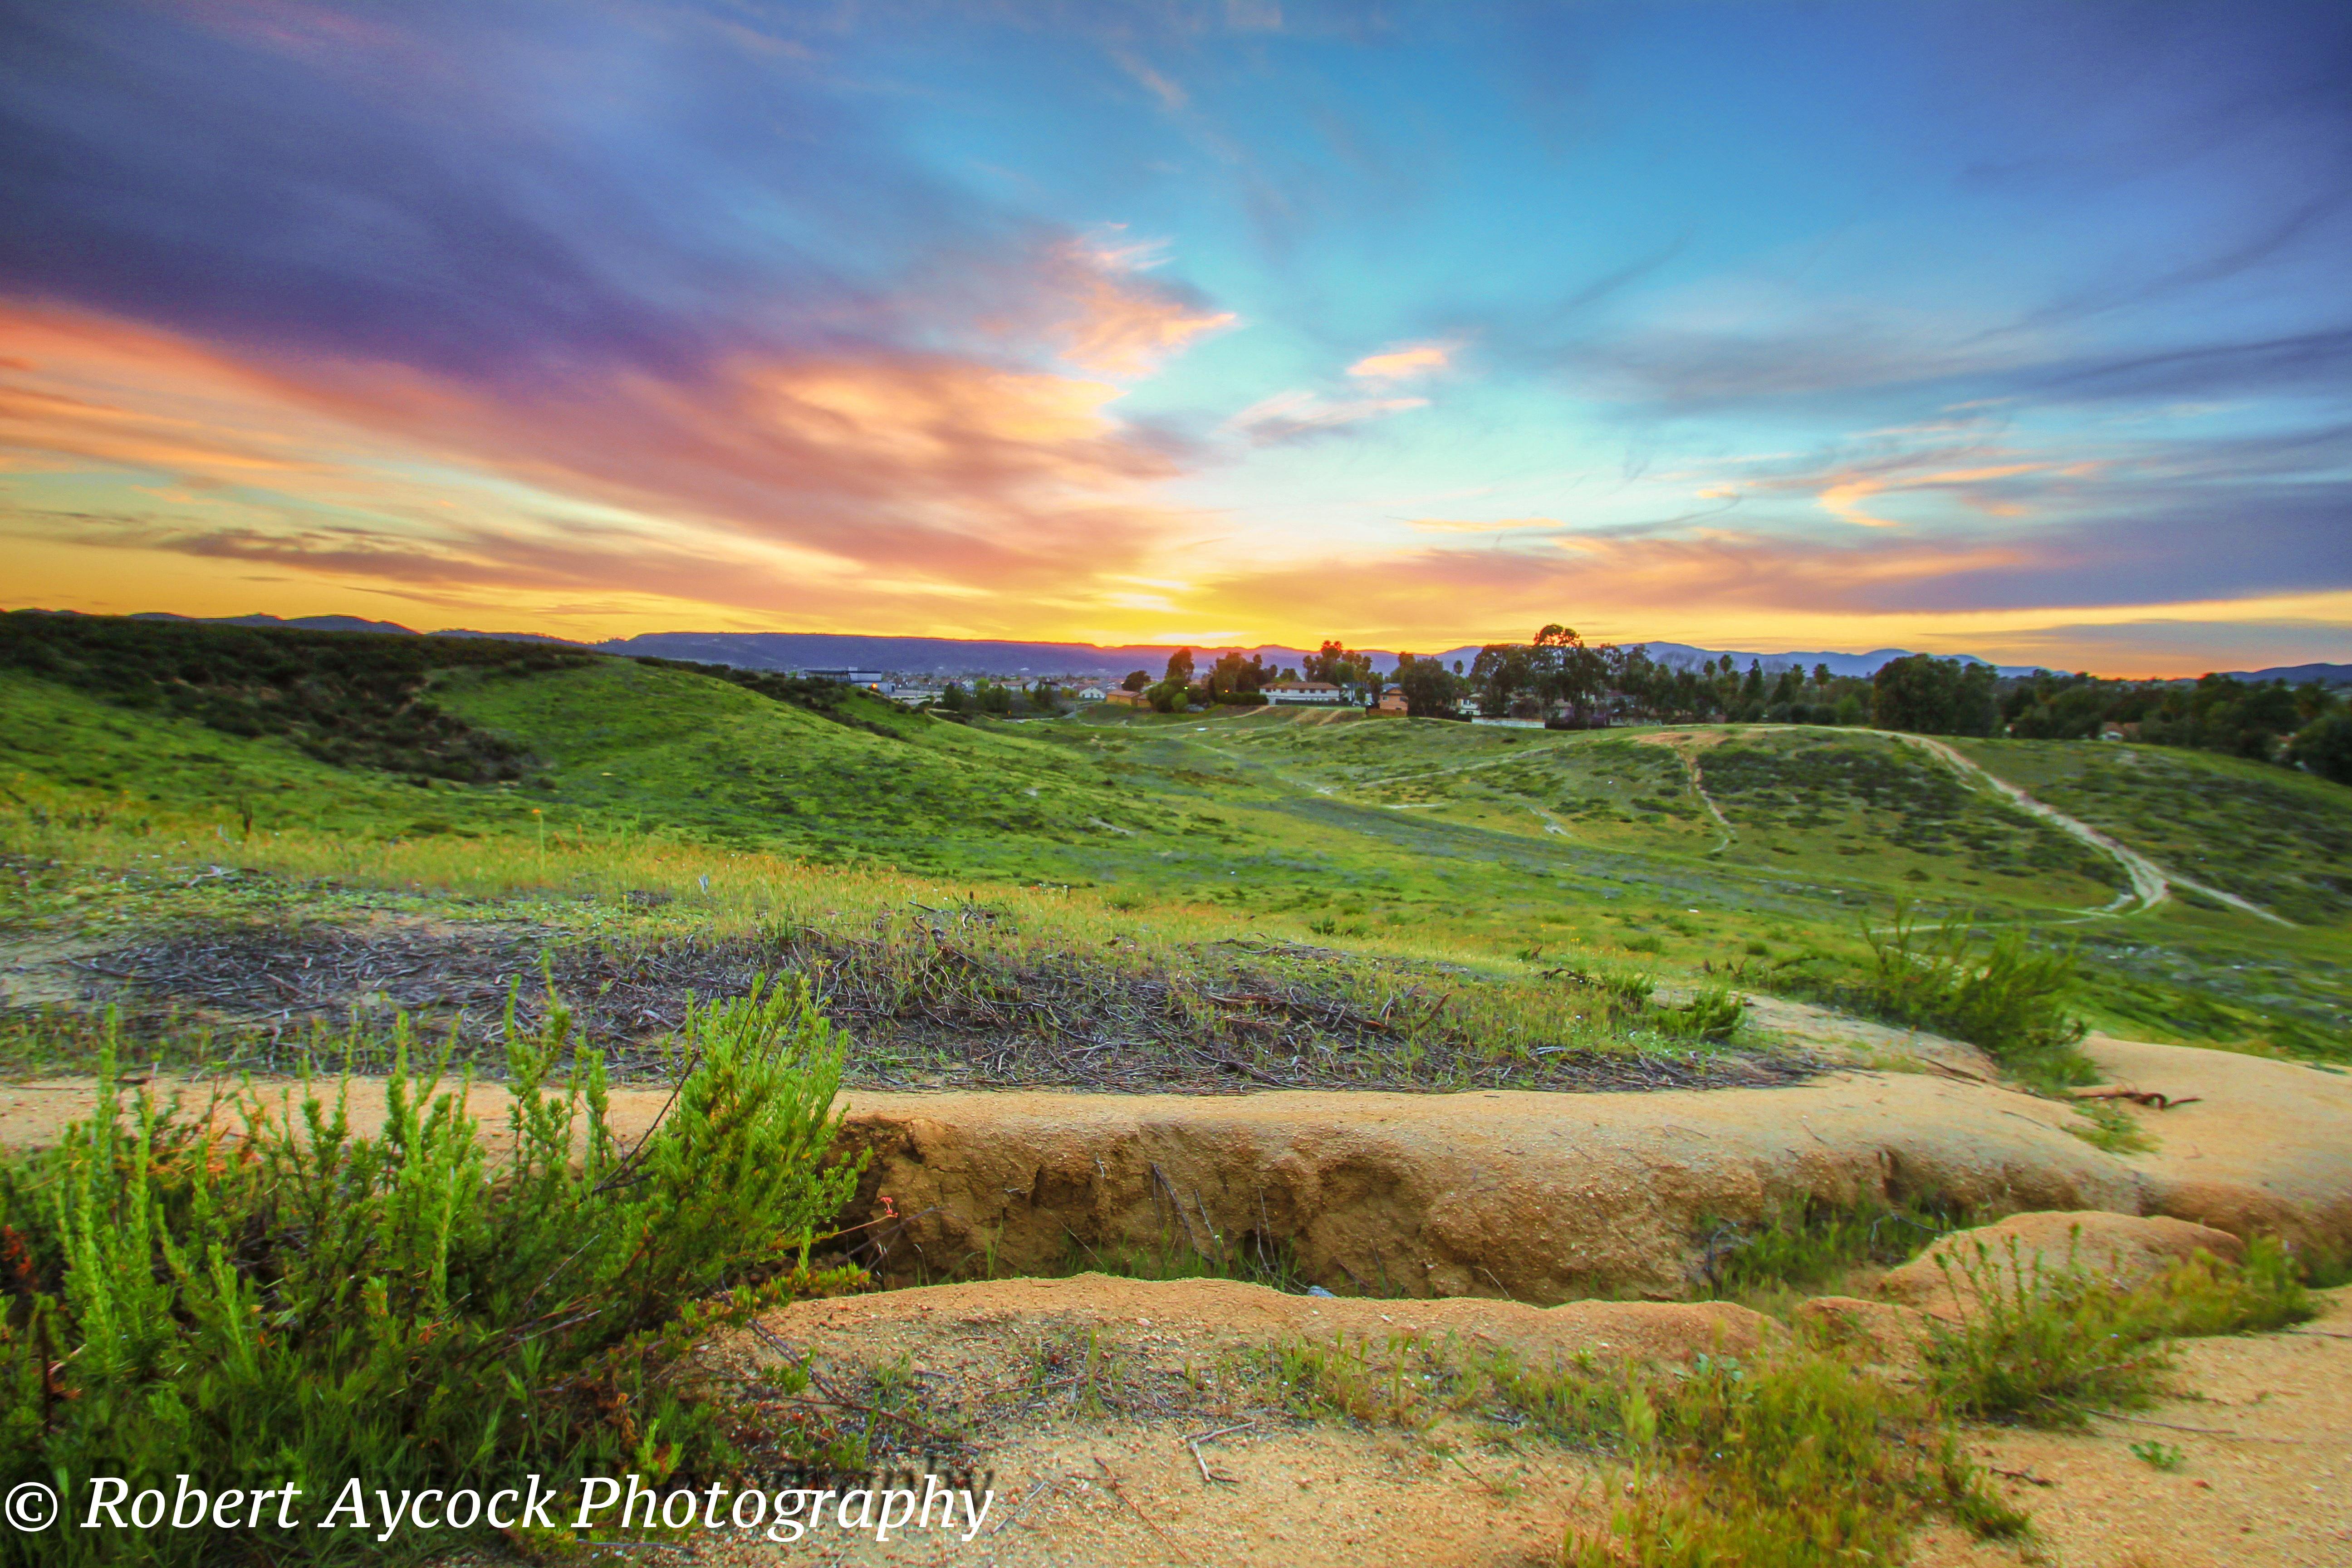 hintergrundbilder kalifornien stadt sonnenuntergang sommer himmel berg hei baum. Black Bedroom Furniture Sets. Home Design Ideas